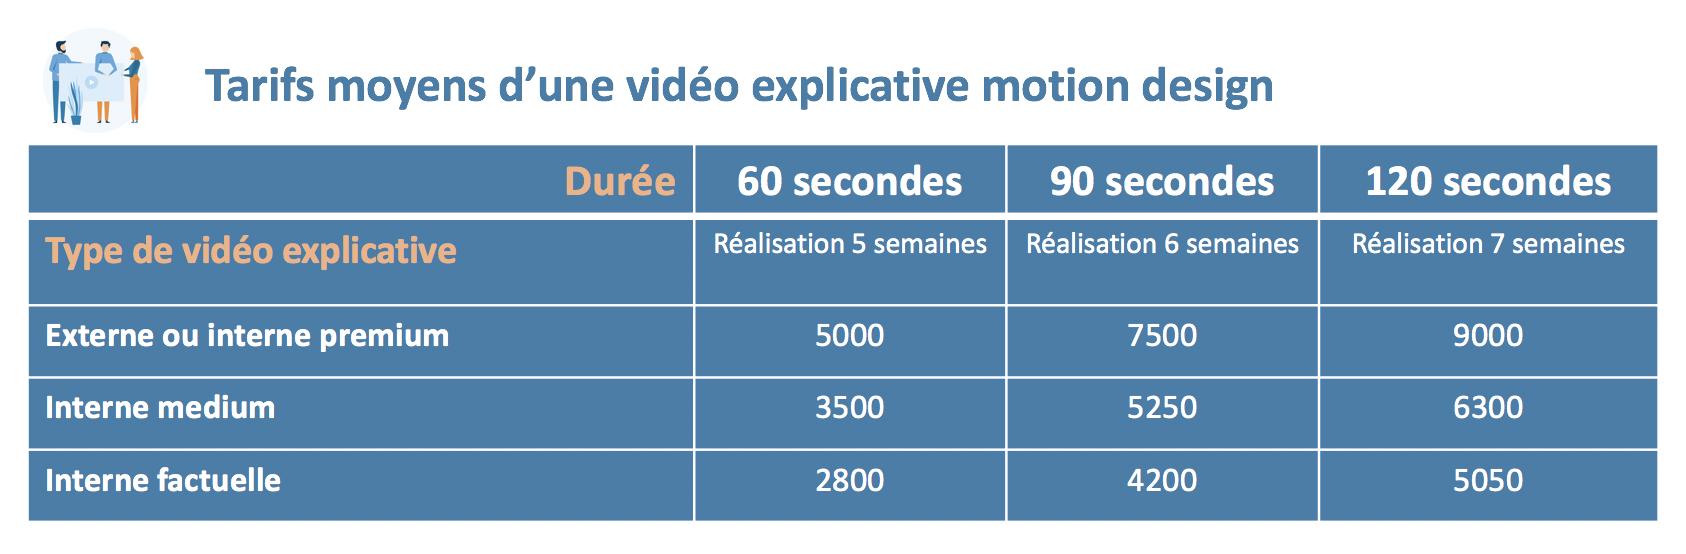 tarifs moyens videos explicatives 2019